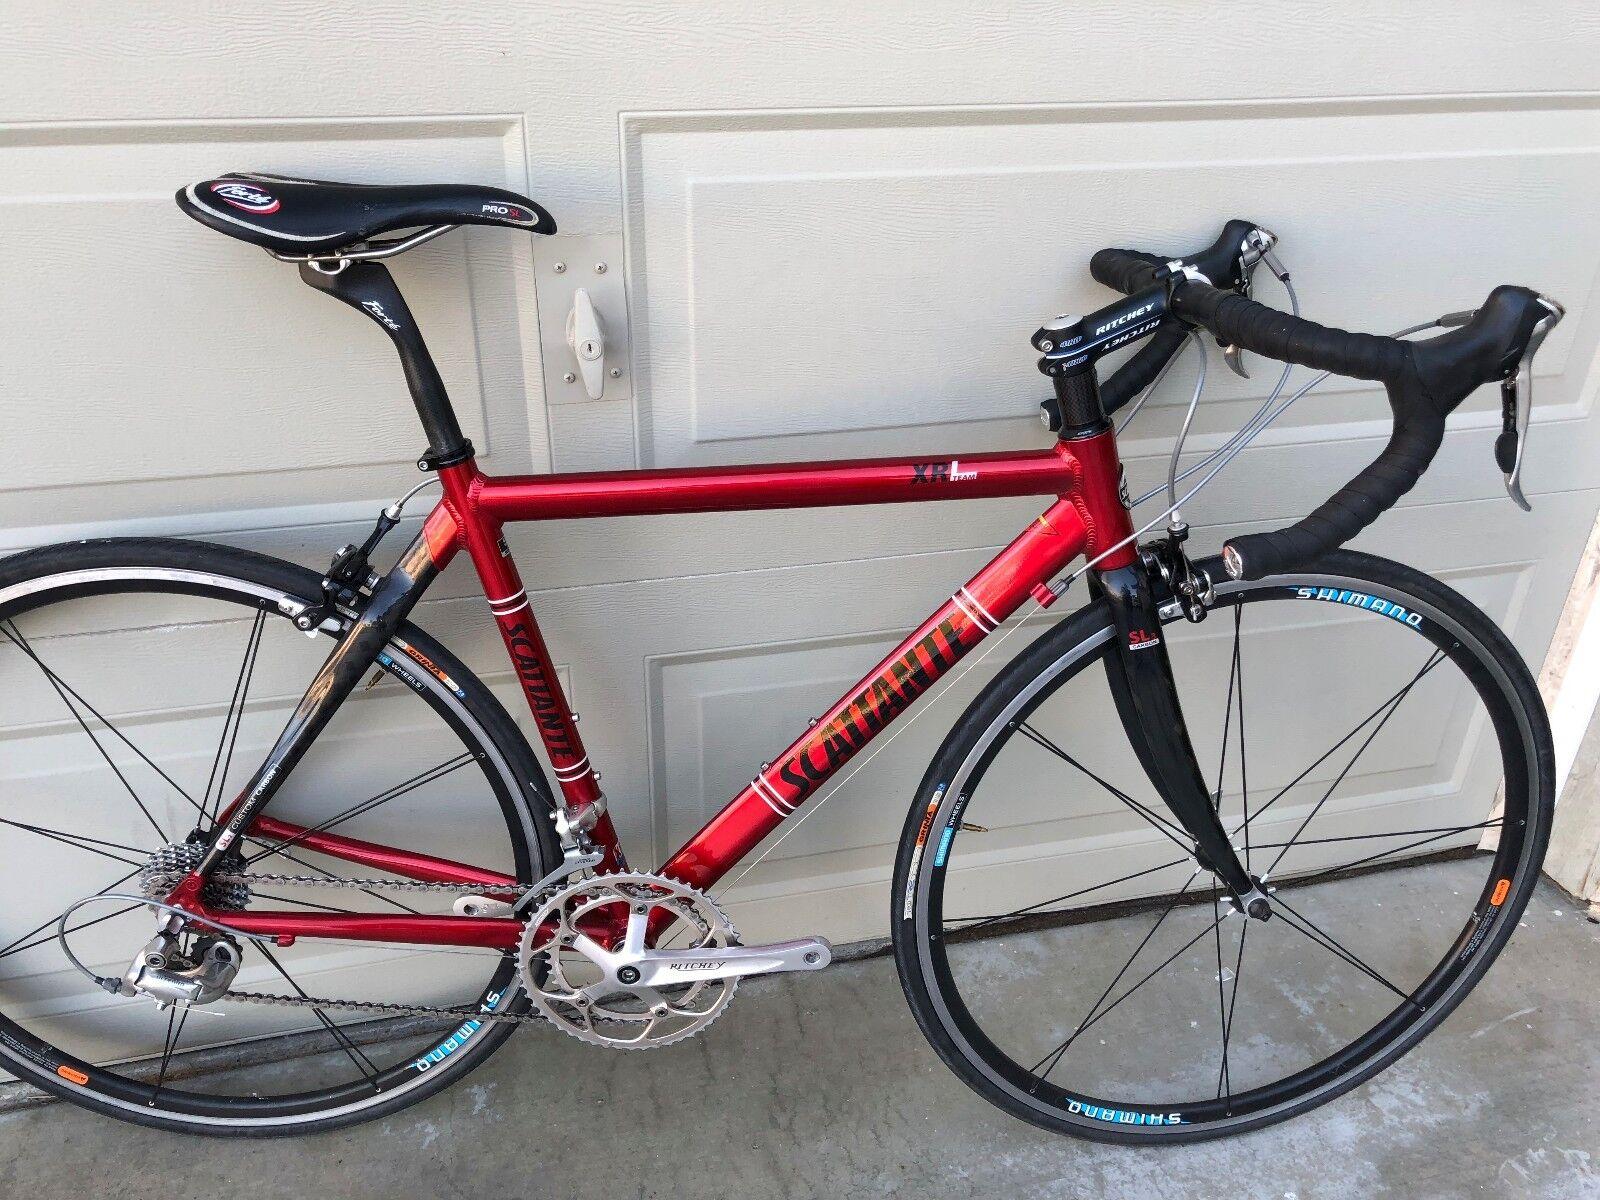 51 CM Scattante Team XRL Carbon Aluminum Shimano Ultegra 18 speed road bike